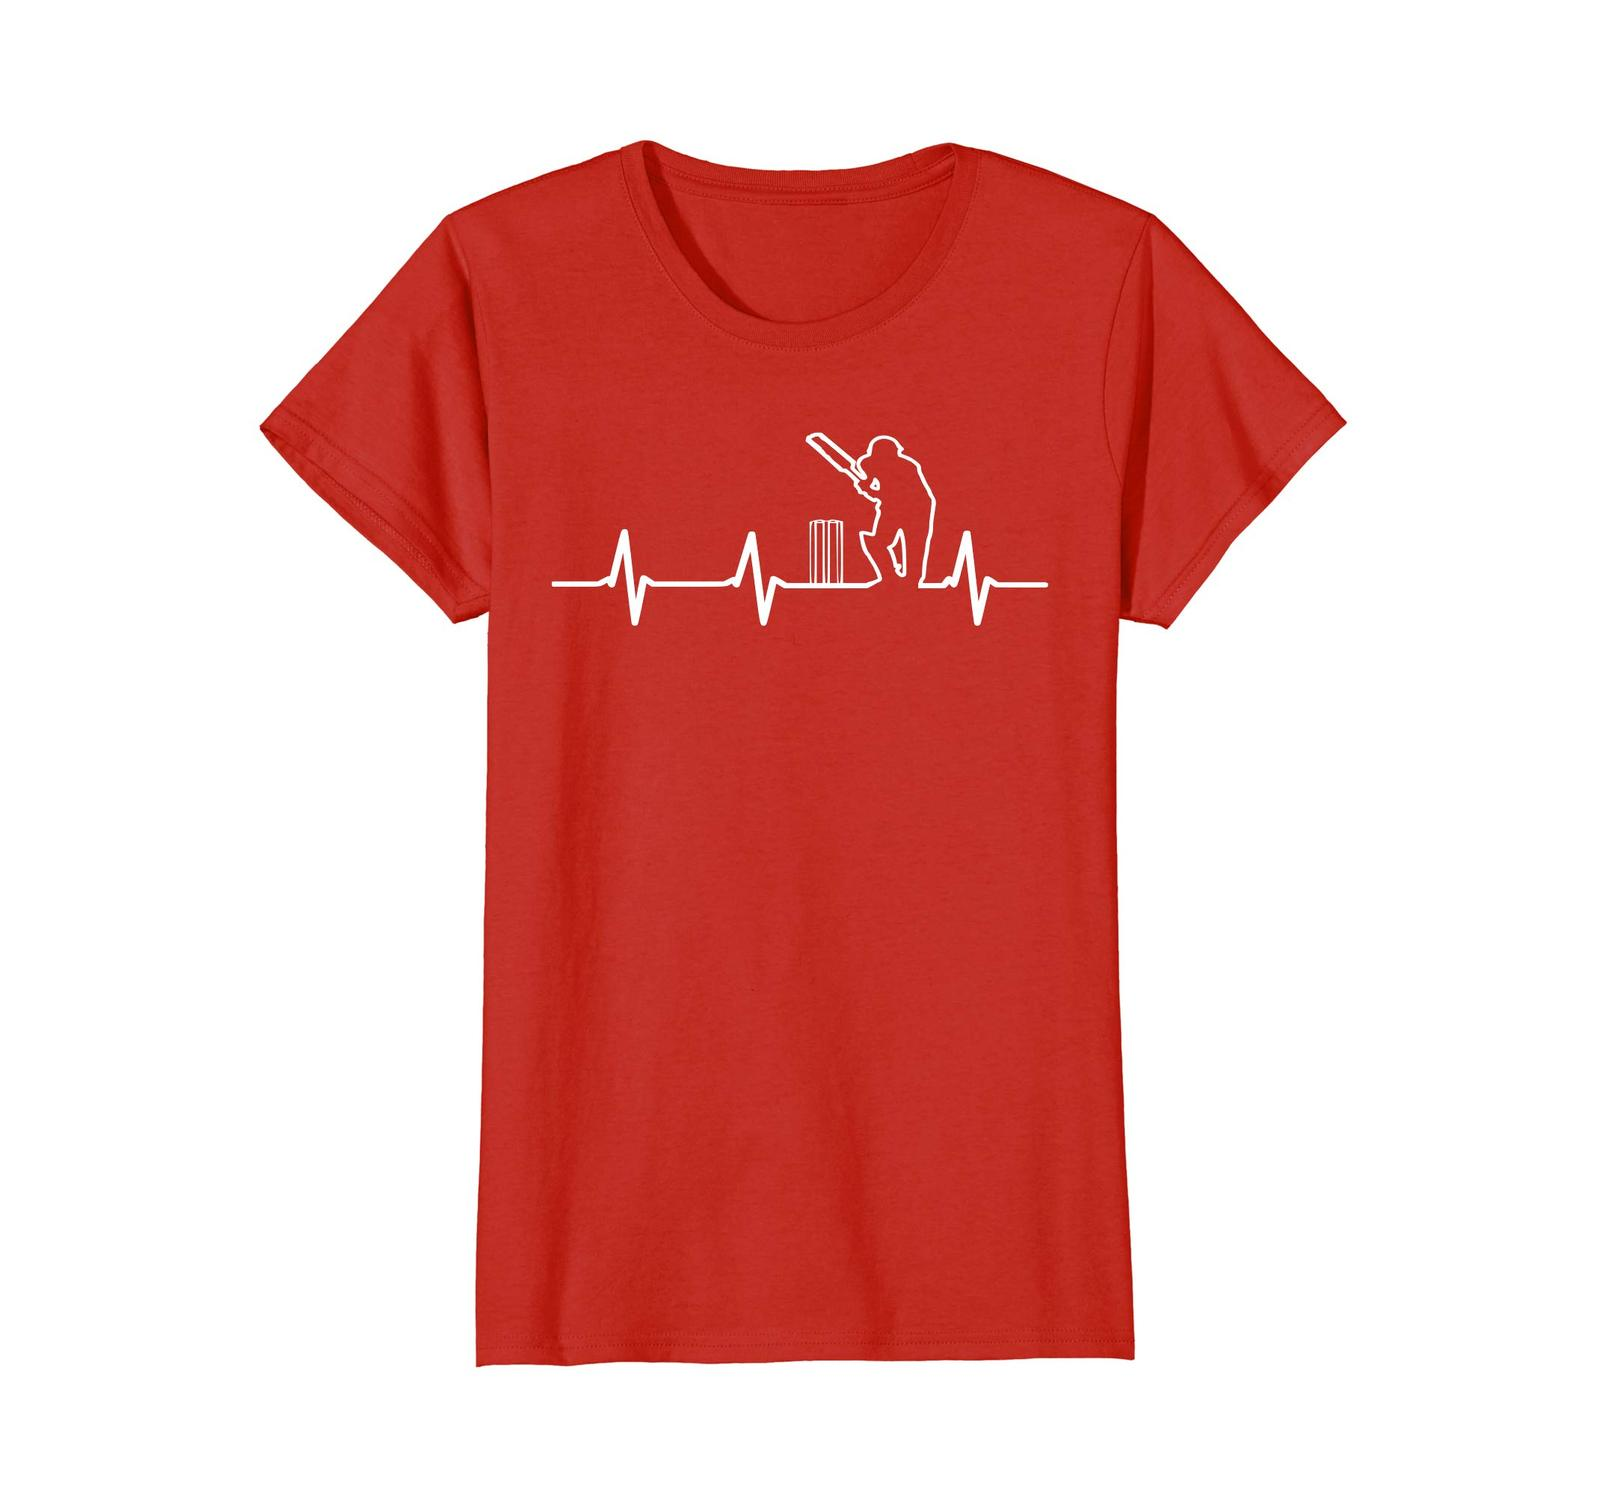 Funny Tee -  Cricket Coolest T shirt | Cricket In My Heartbeat Wowen